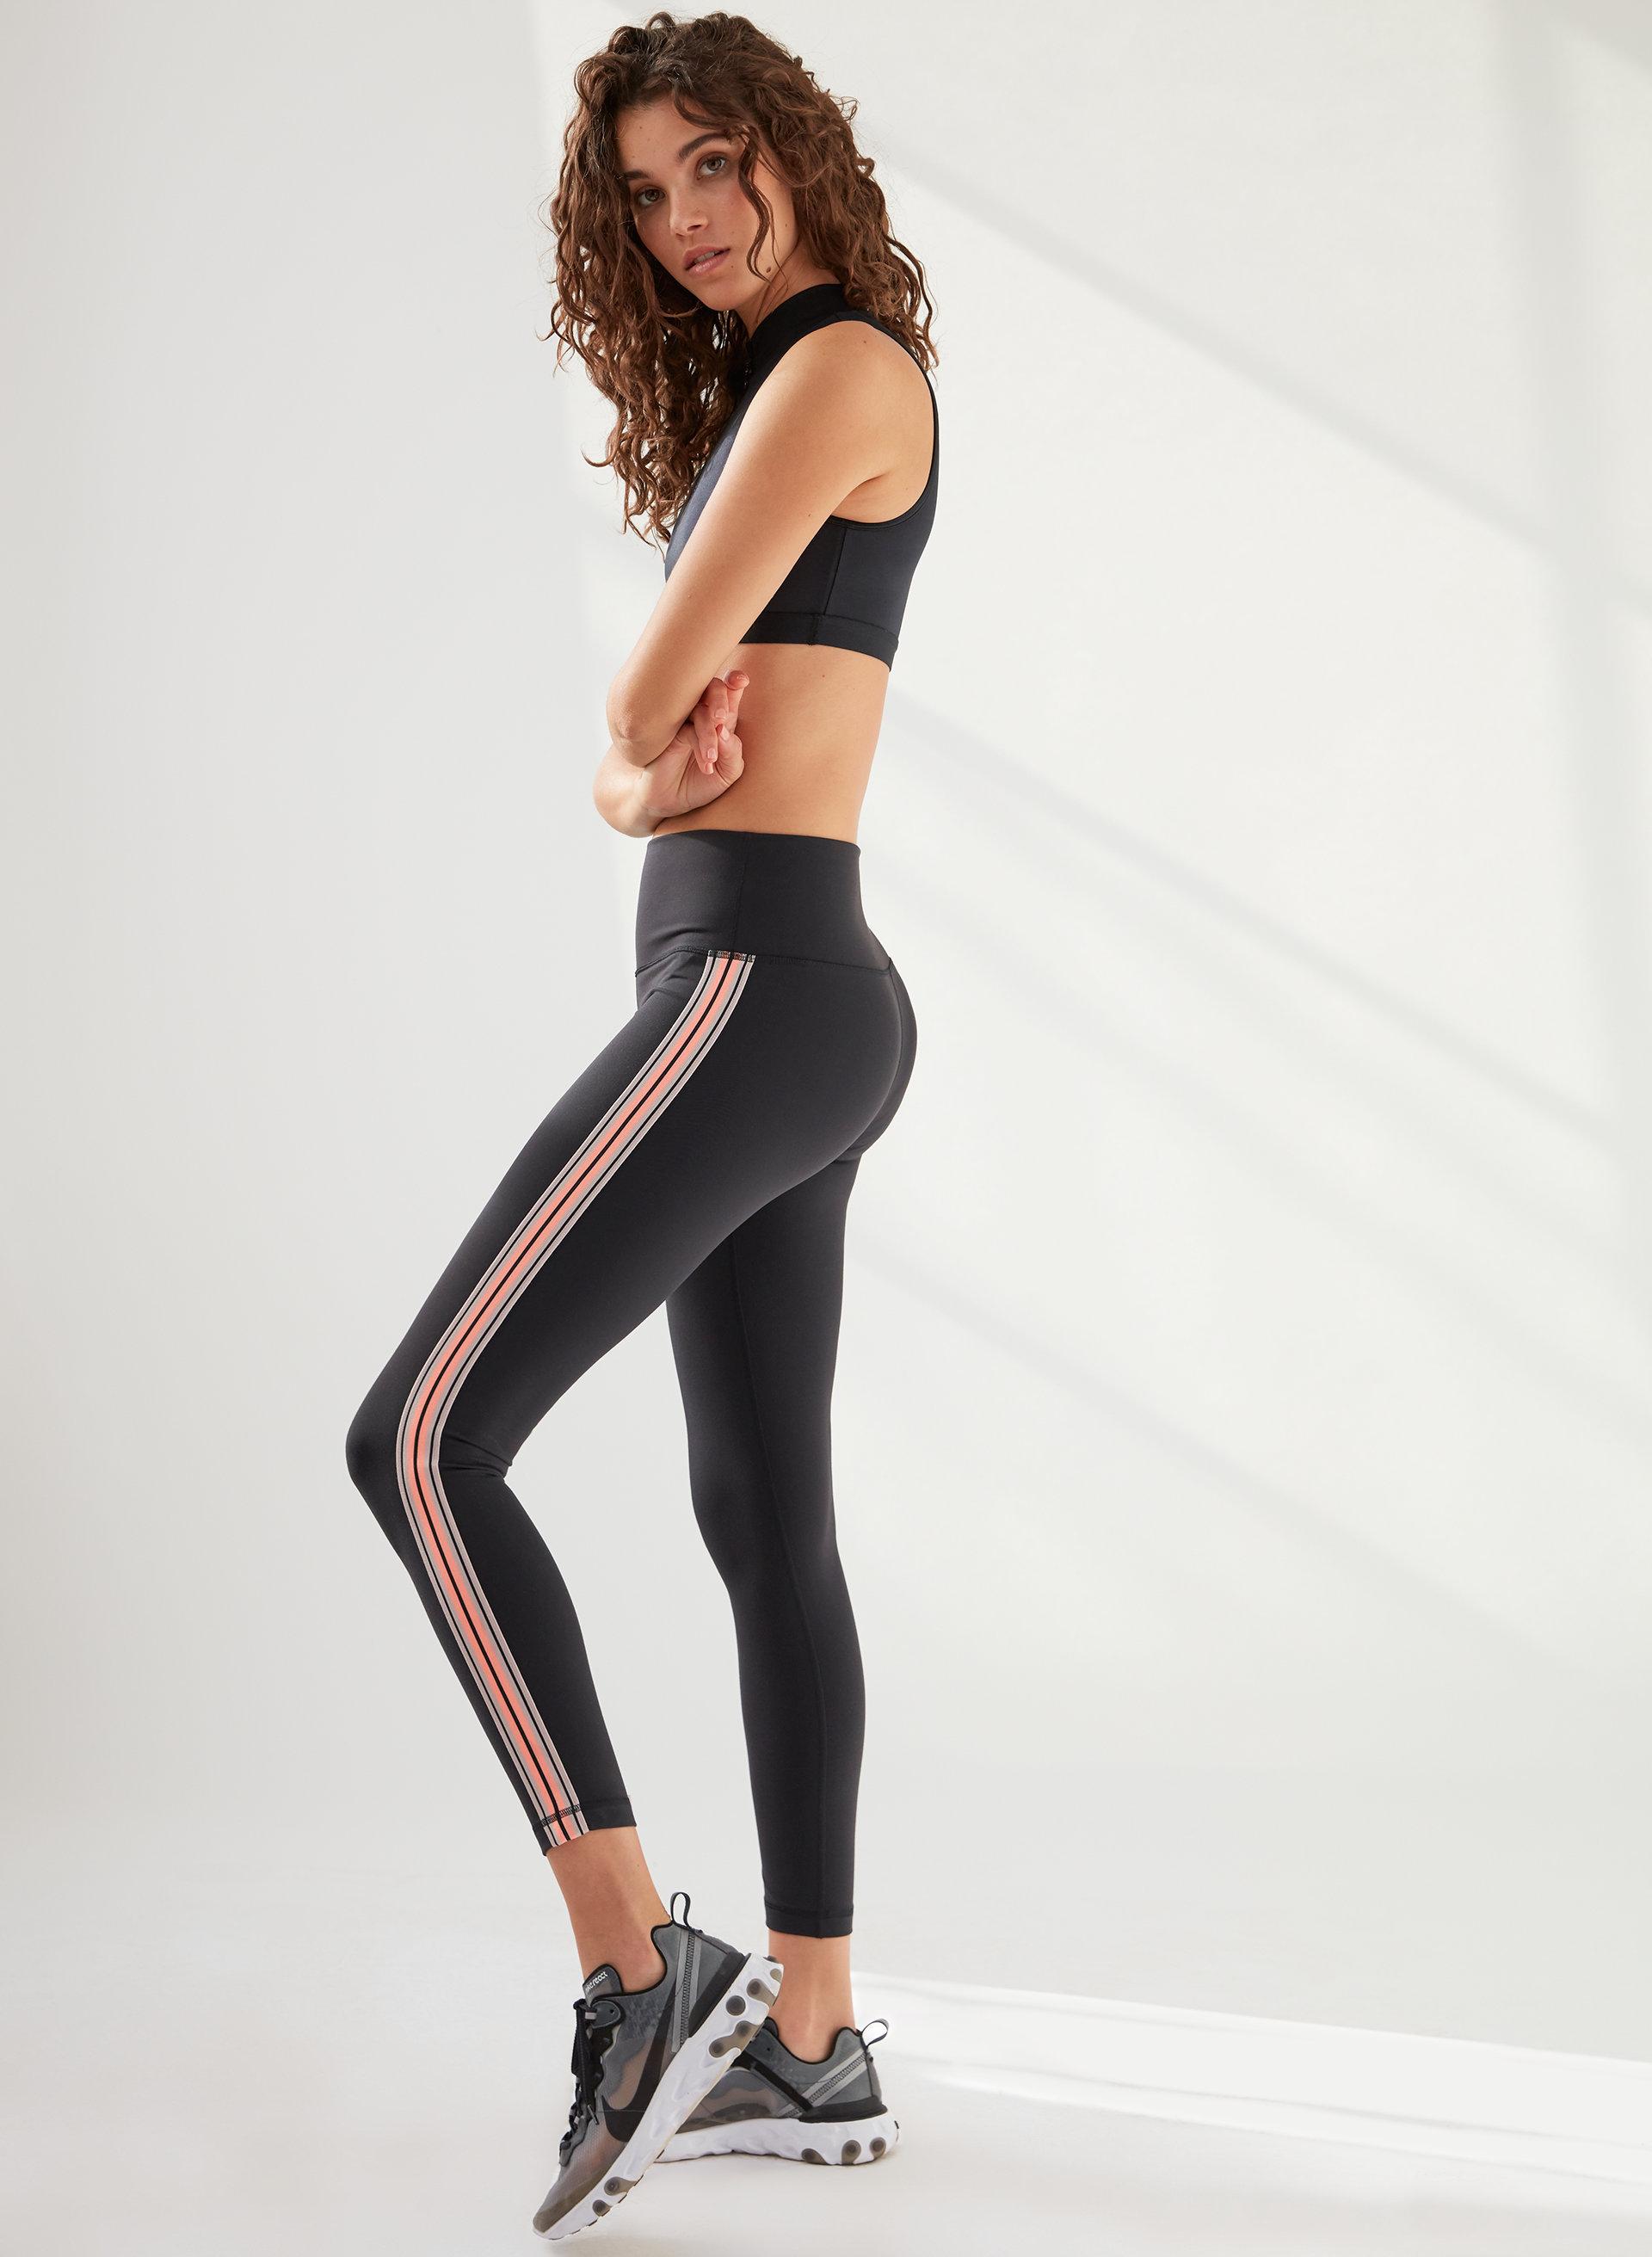 ae85d4fc067ba atmosphere legging High-waisted legging with side stripe